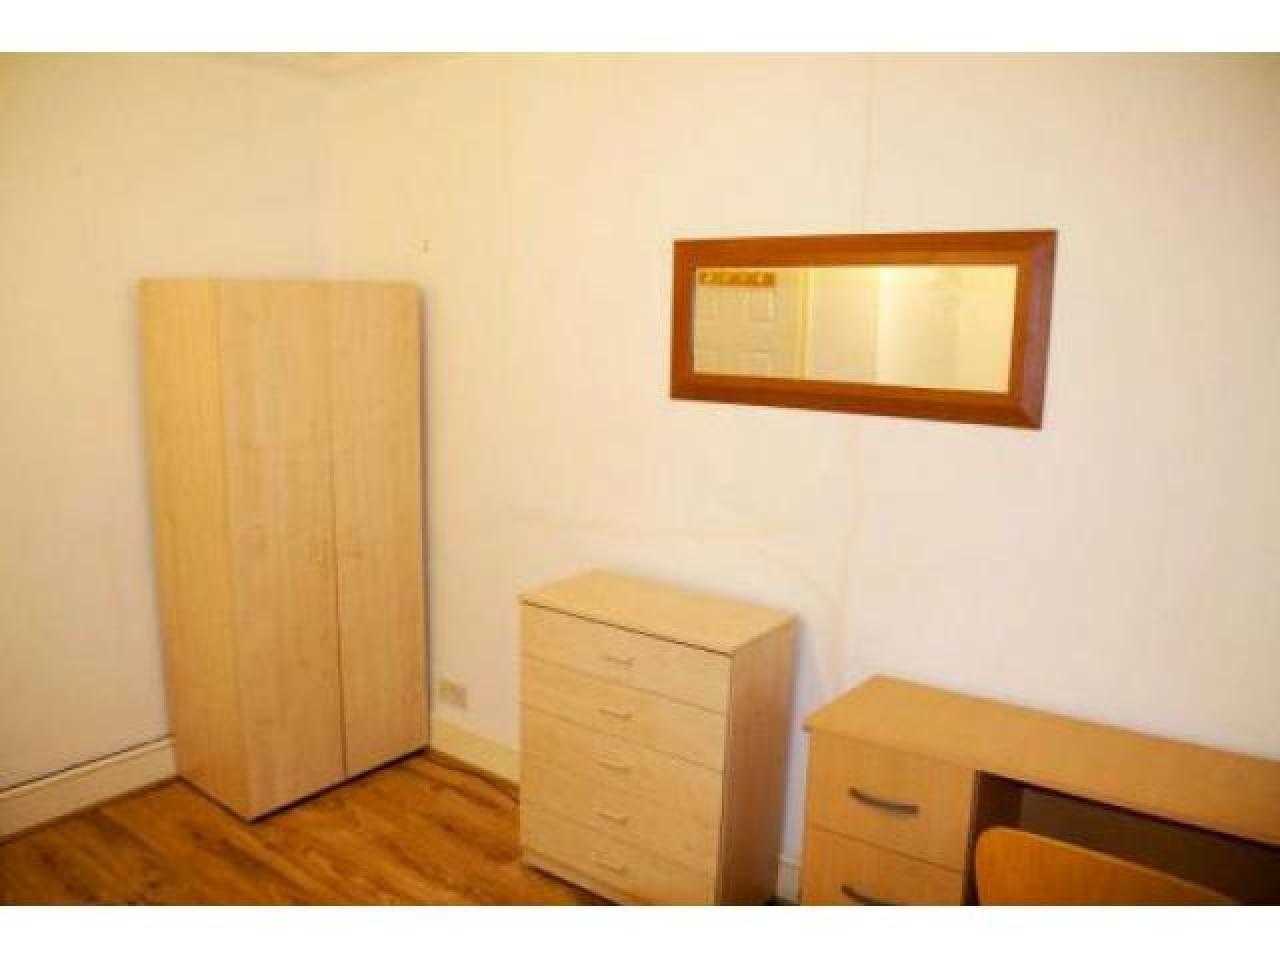 Комната для одного на Walthamstow / Blackhorse road - 3